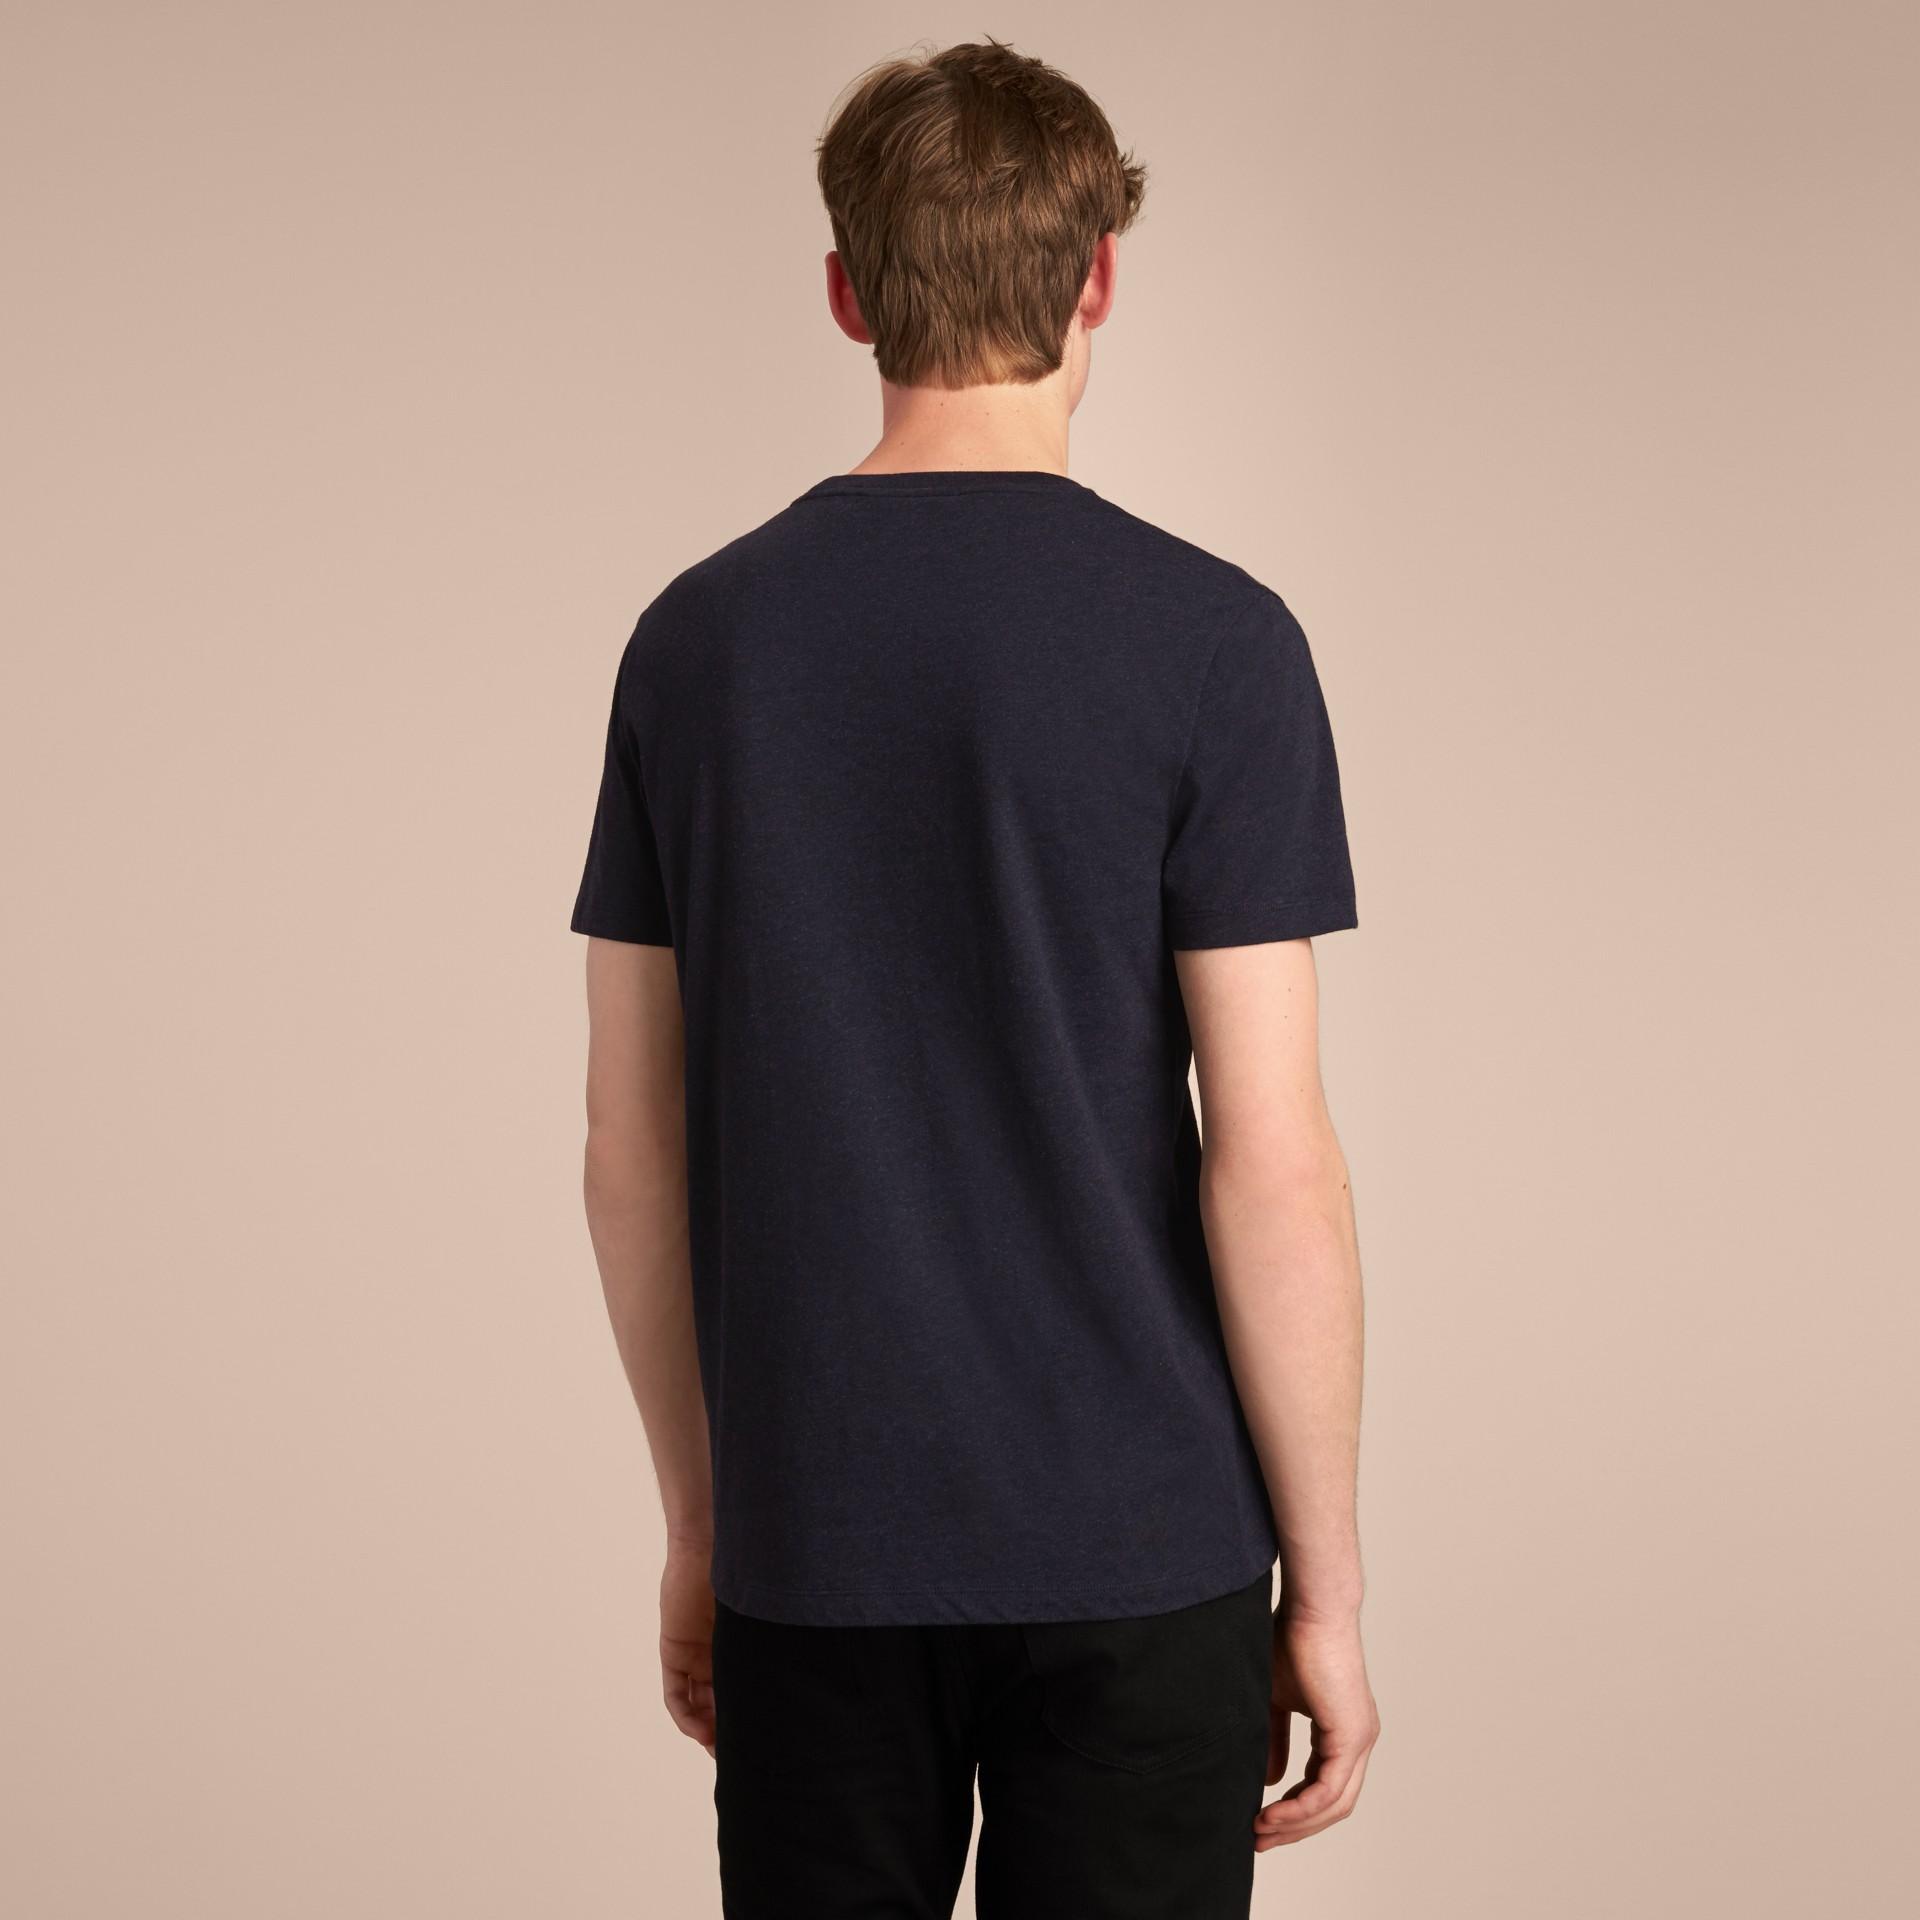 Devoré Cotton Jersey T-shirt in Navy Melange - gallery image 3